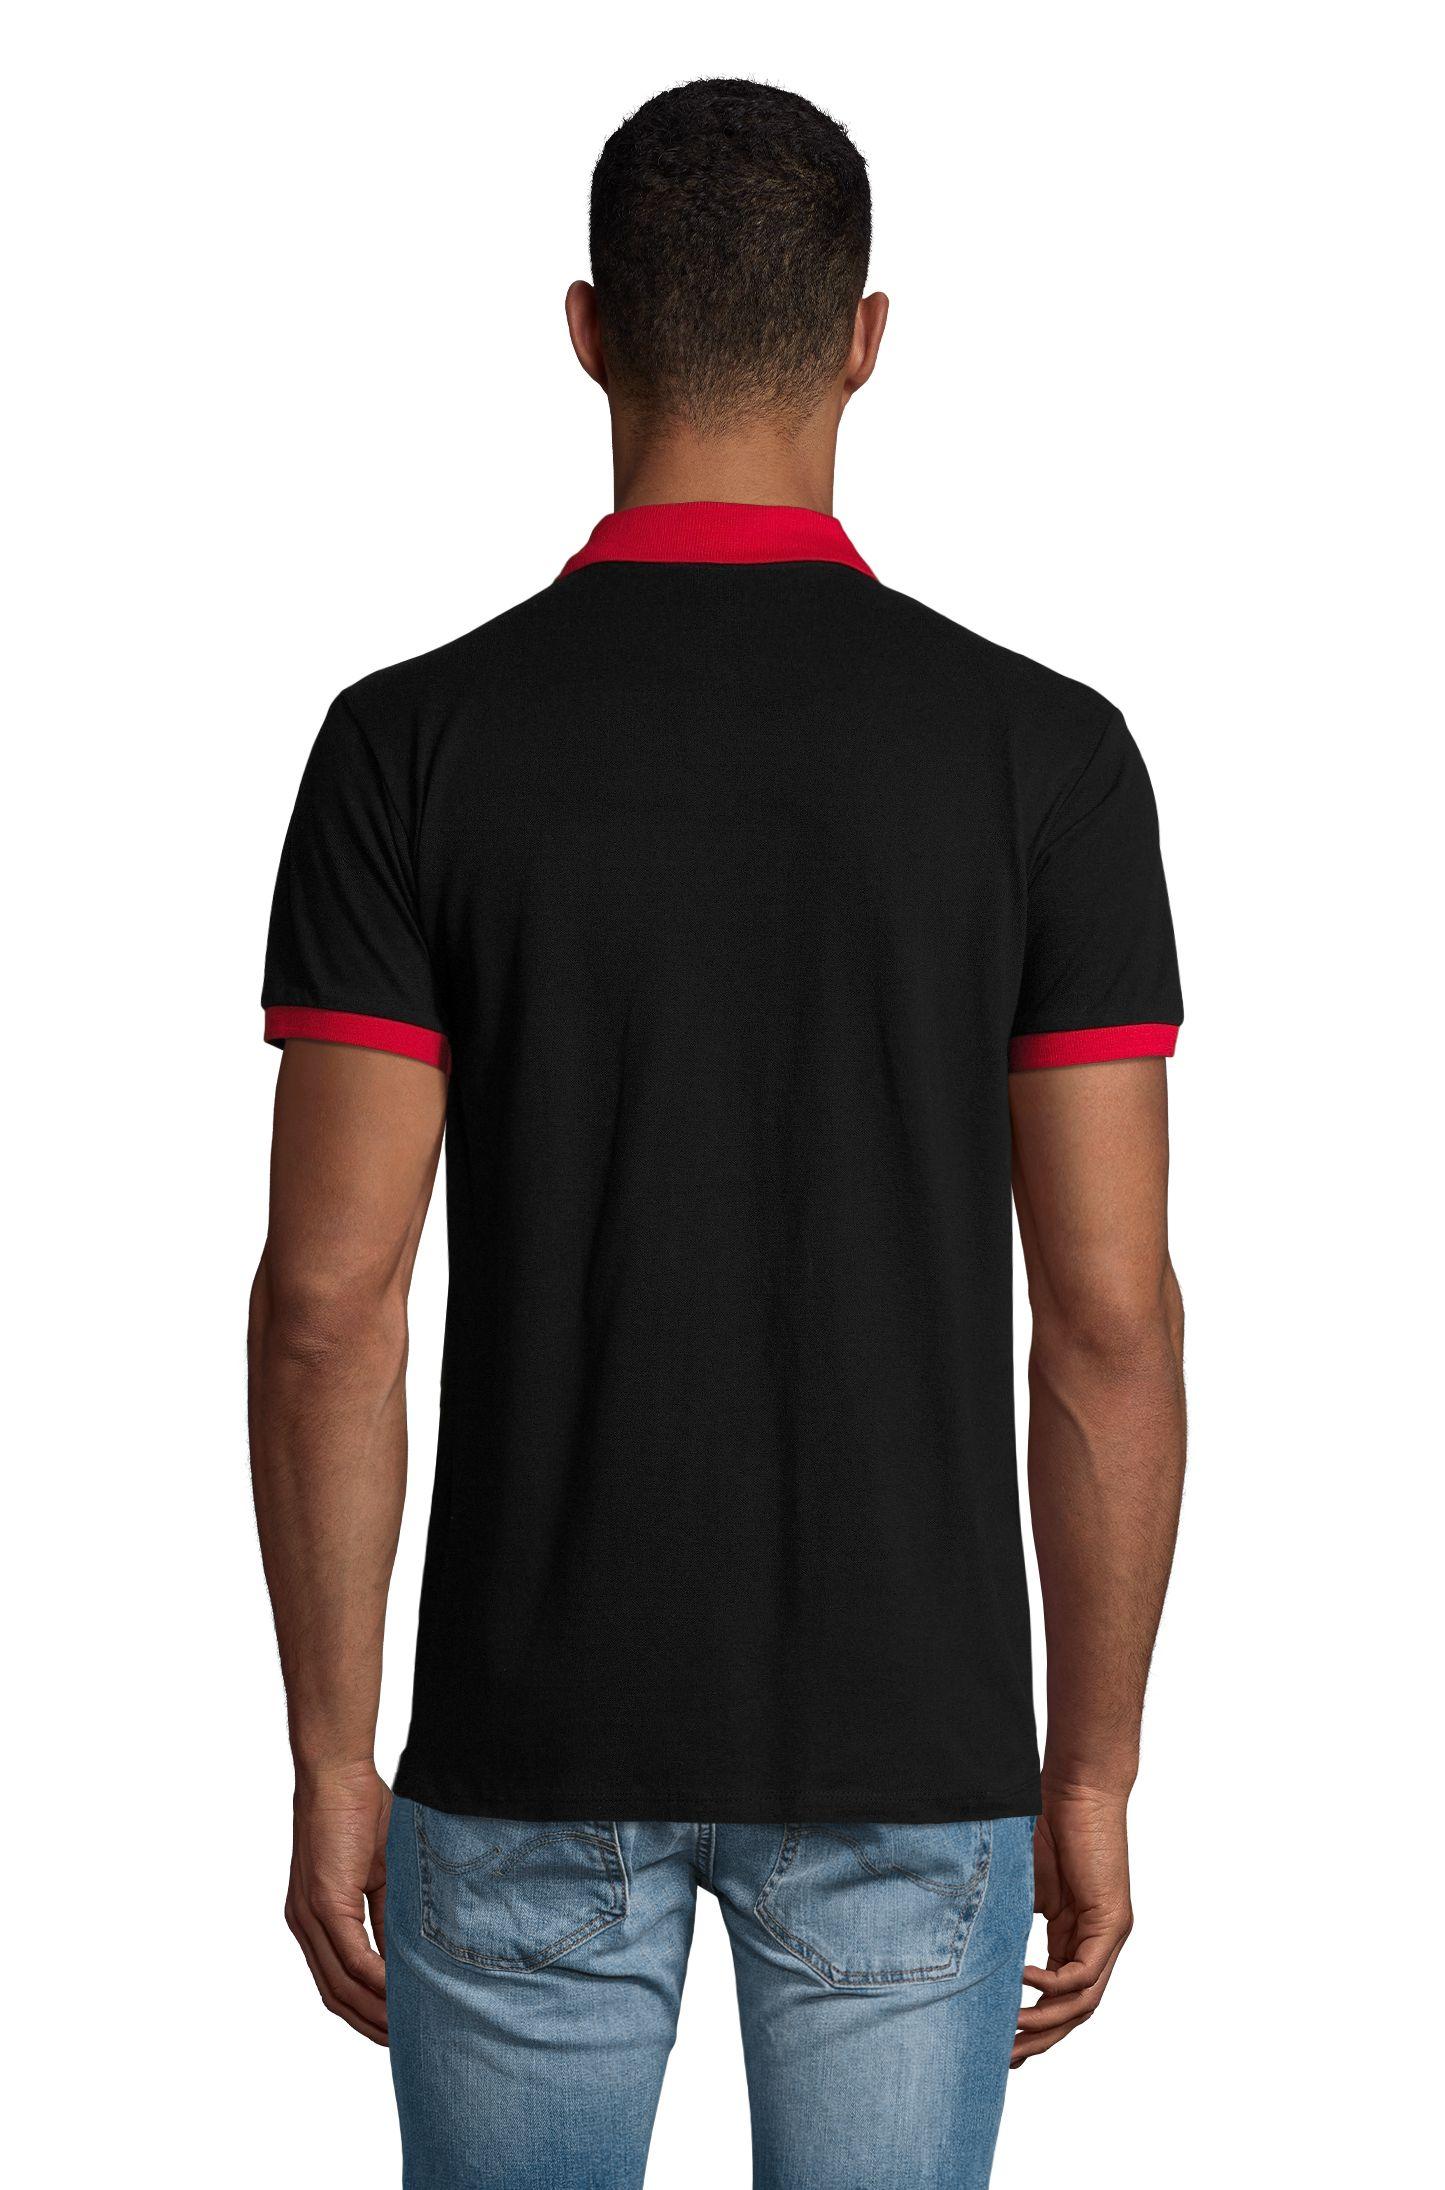 917 - Black / Red